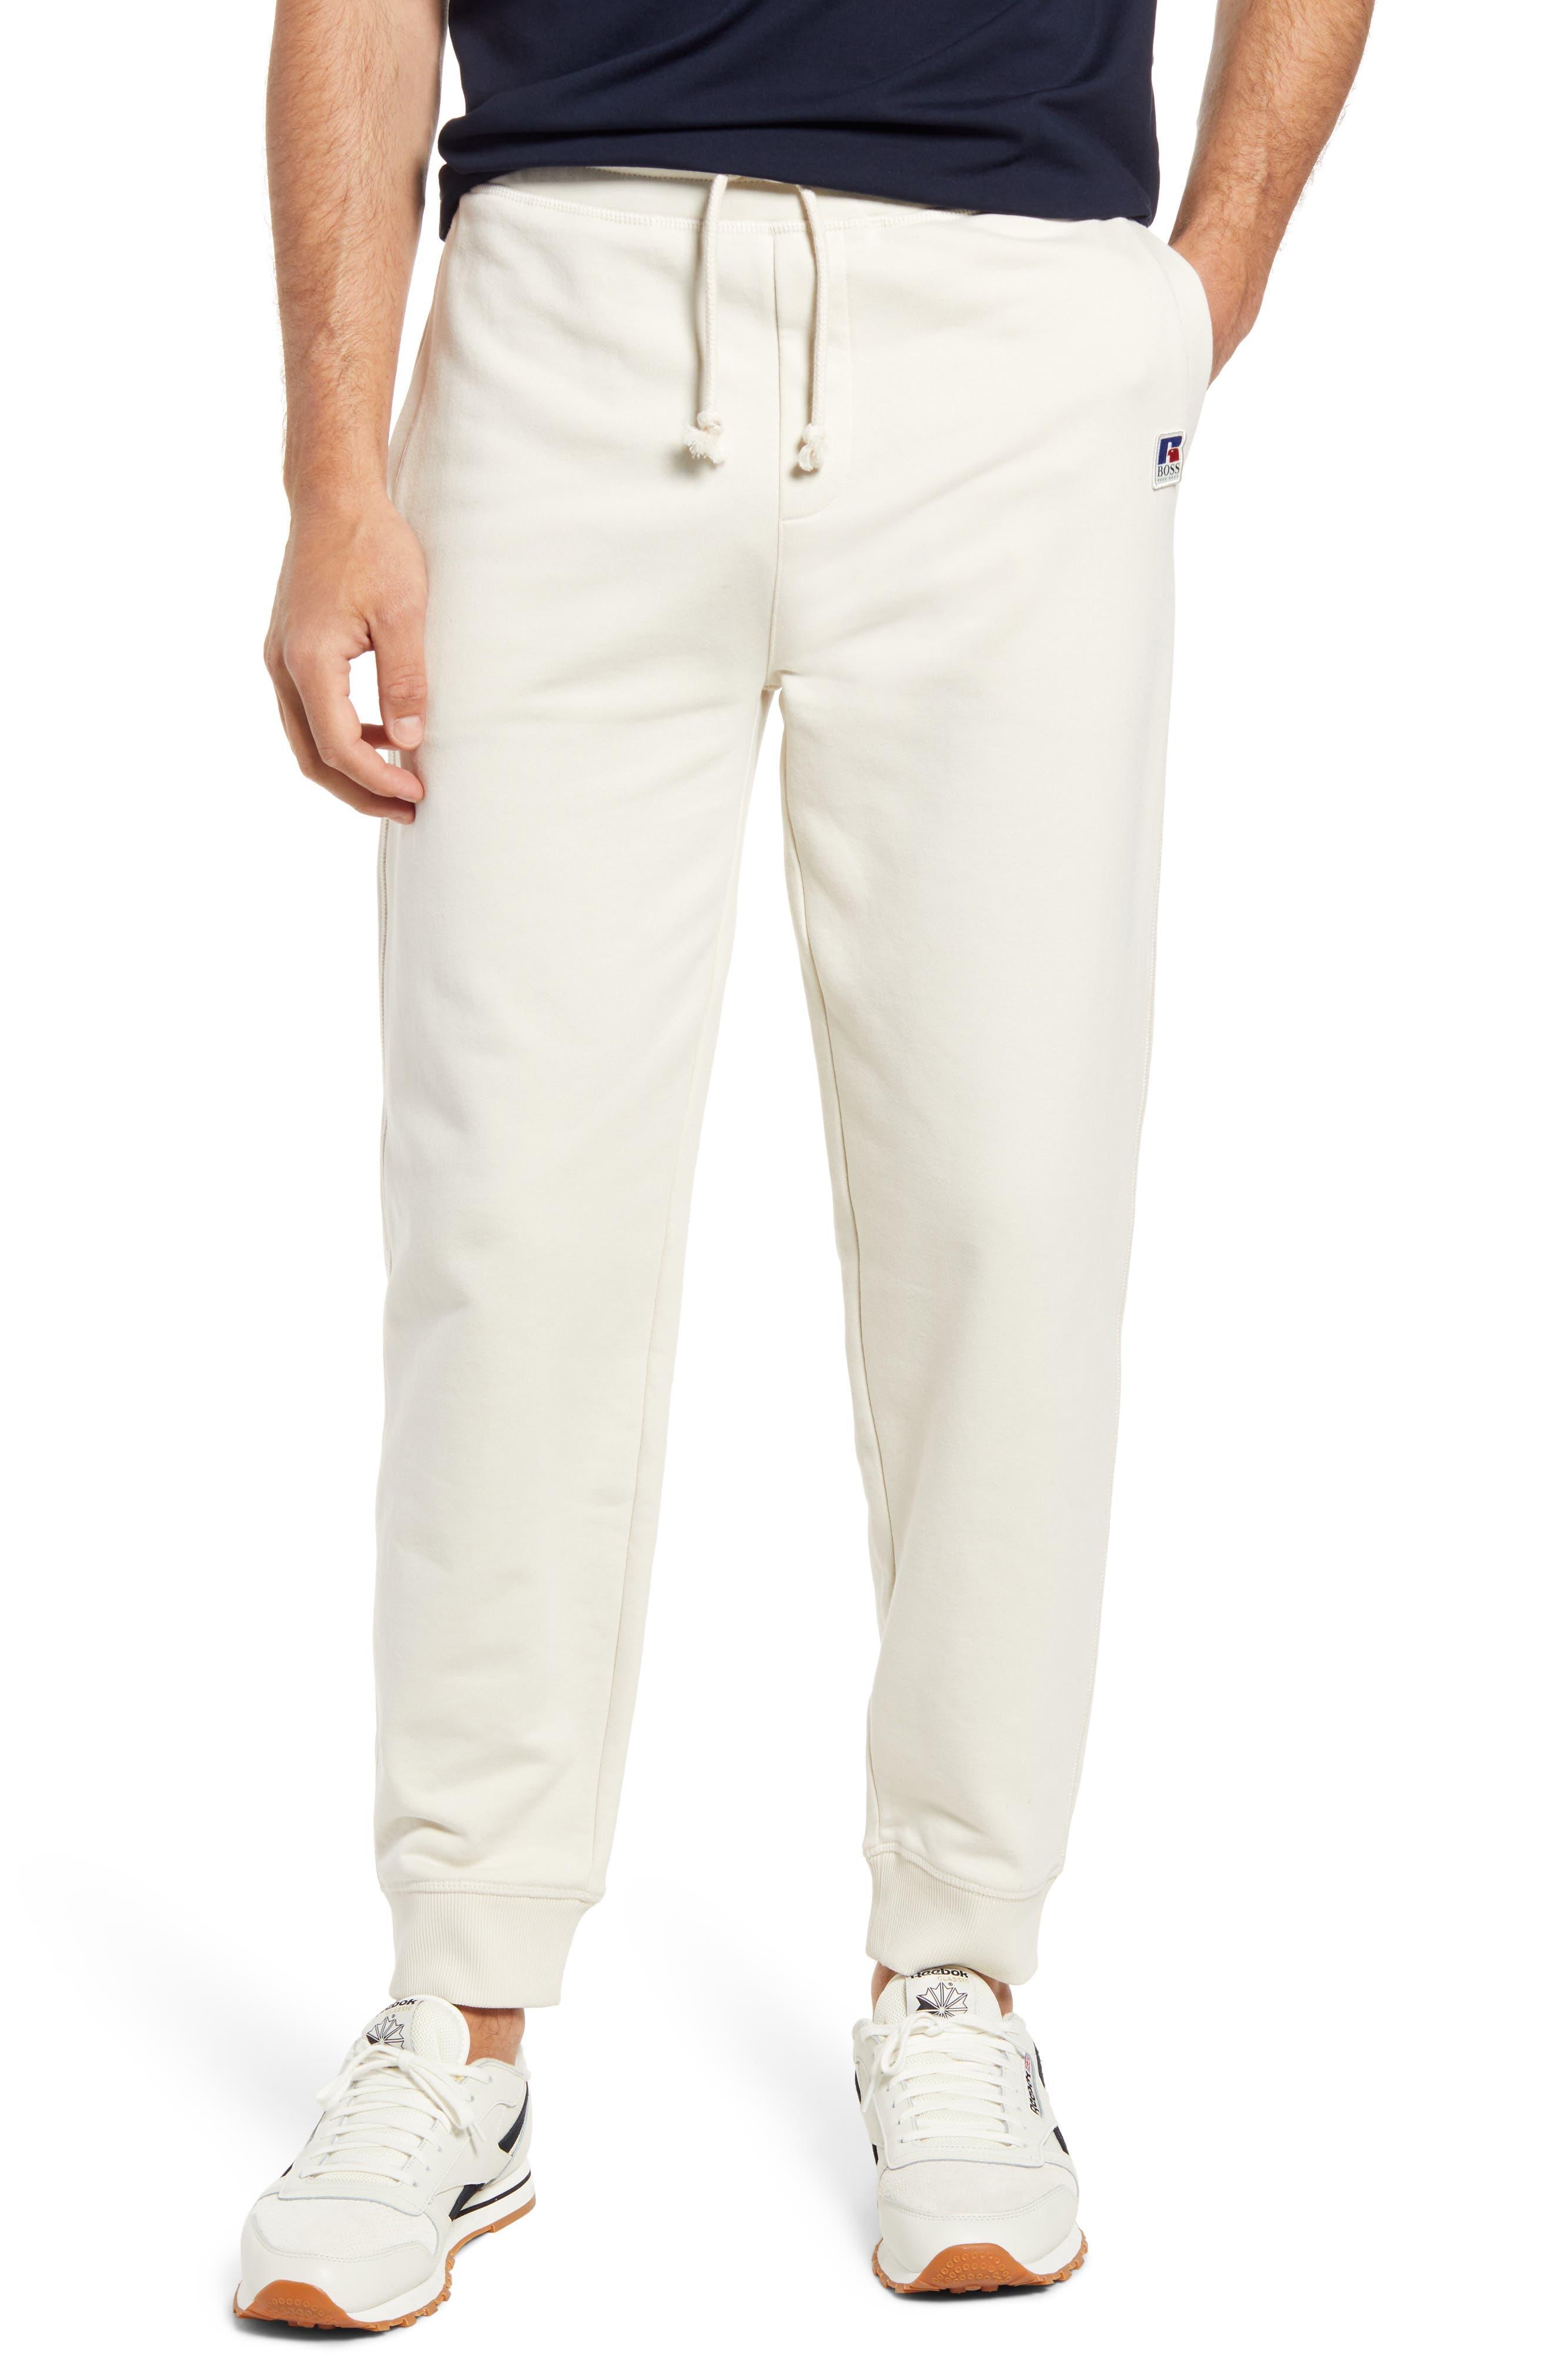 Boss x Russell Athletic Men's Jafara Cotton Sweatpants